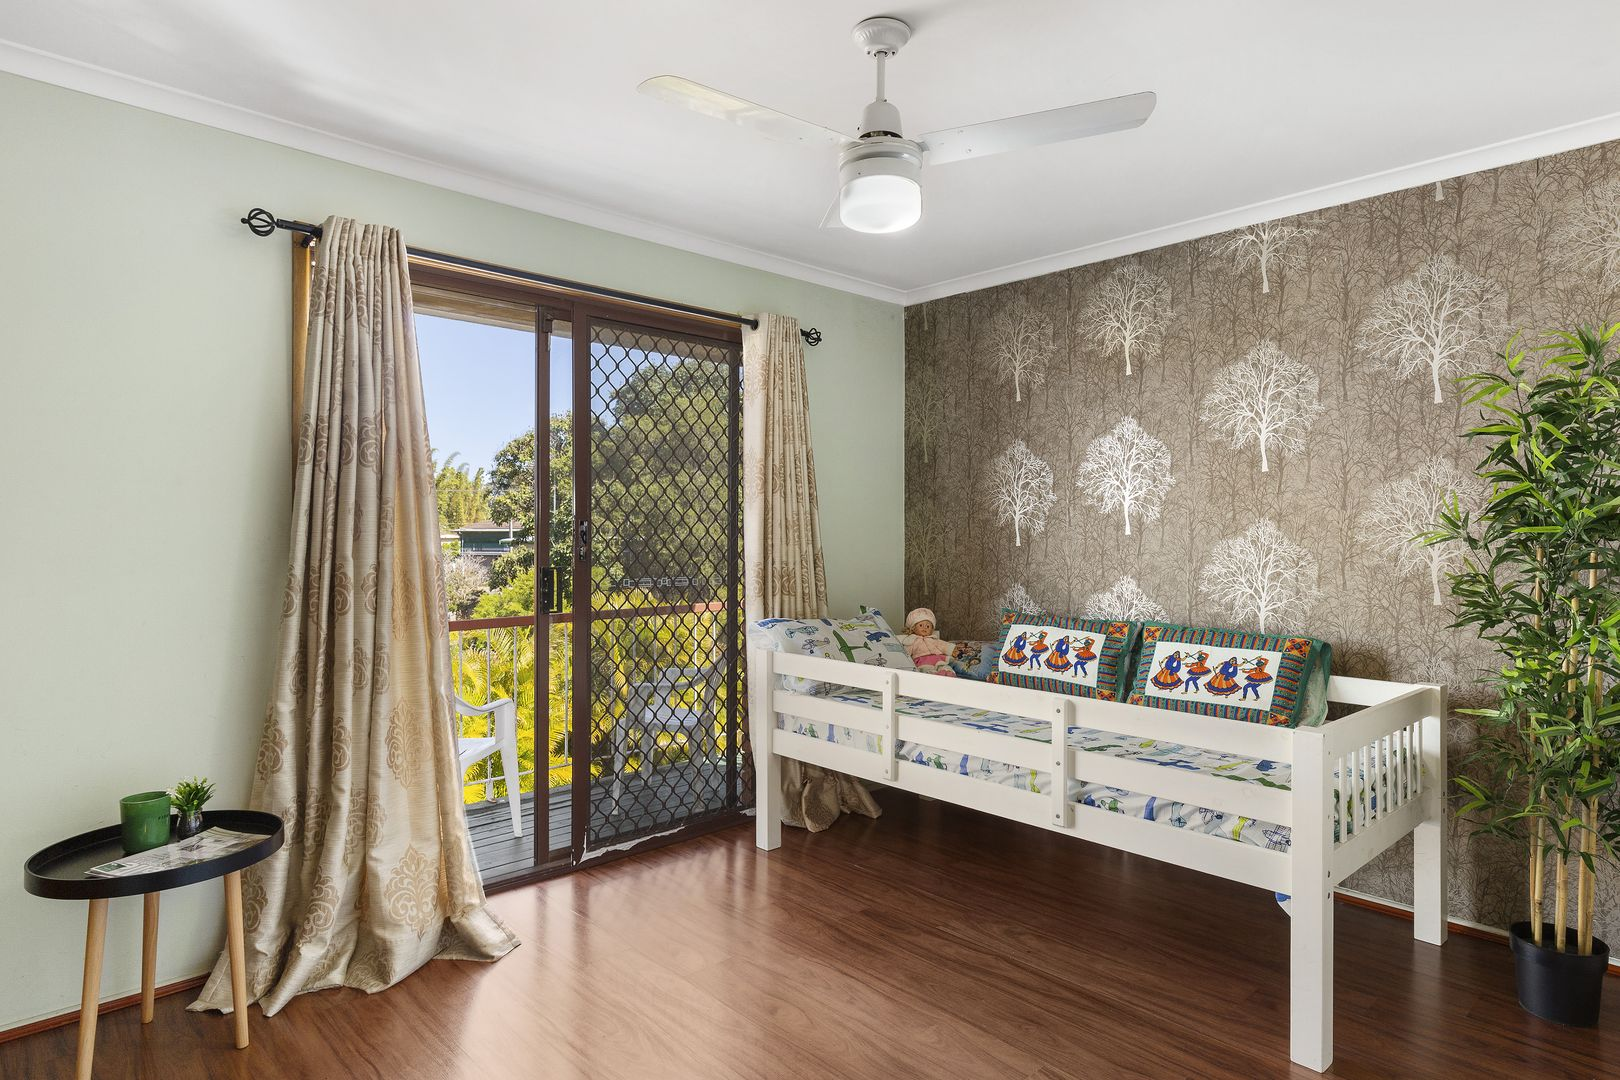 16/22a Kumbari  Street, Rochedale South QLD 4123, Image 2